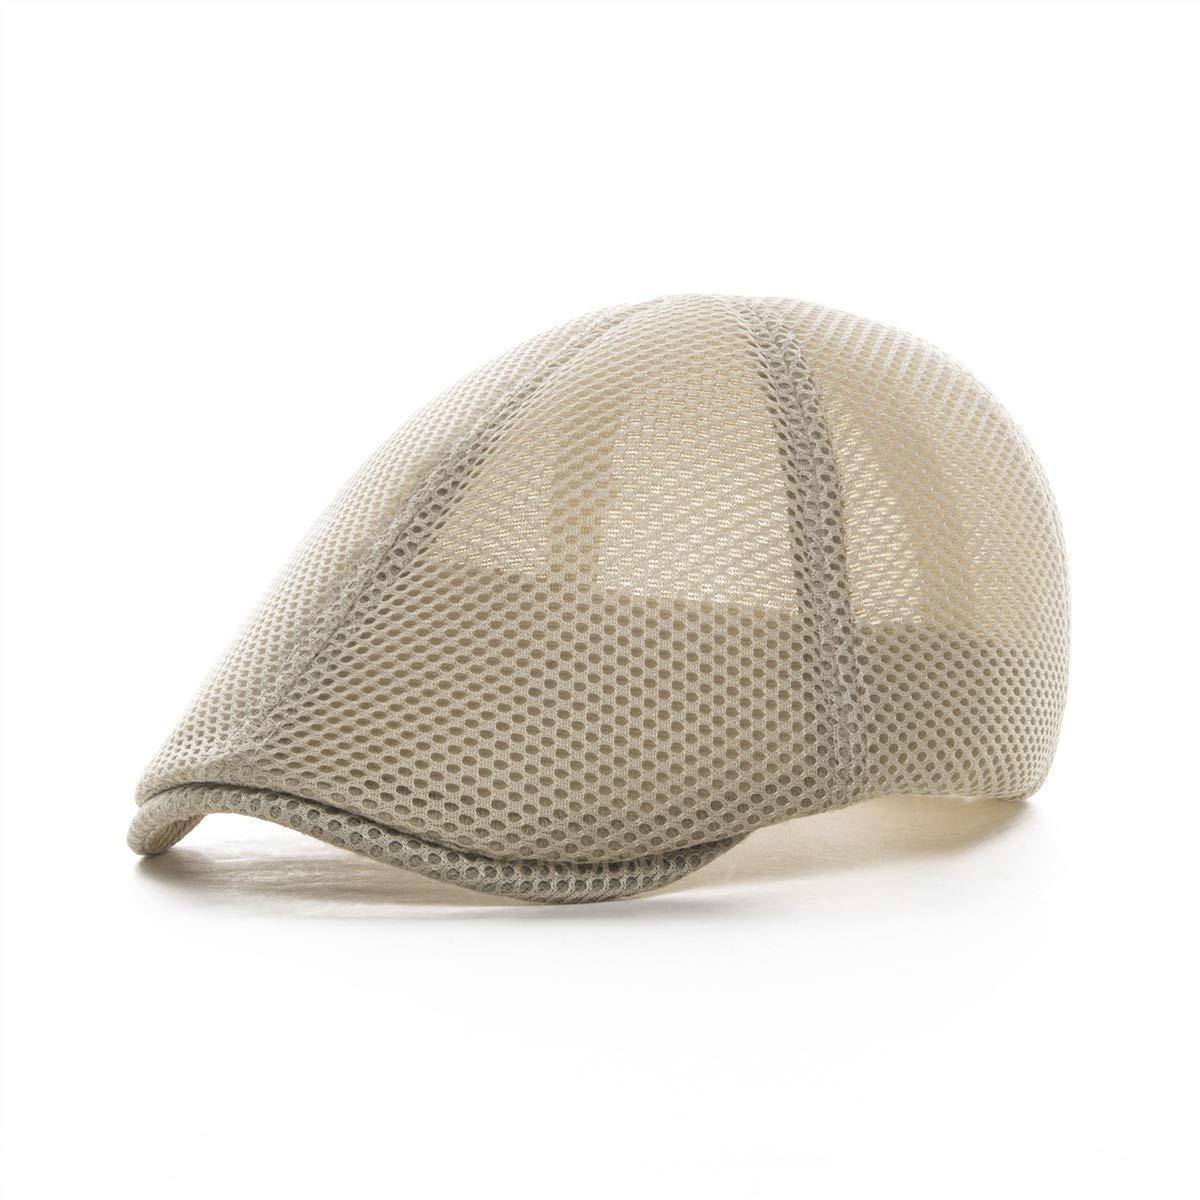 54e7e1fcd7e Galleon - VOBOOM Men Breathable Mesh Summer Hat Newsboy Beret Ivy Cap  Cabbie Flat Cap (Style2- Khaki)